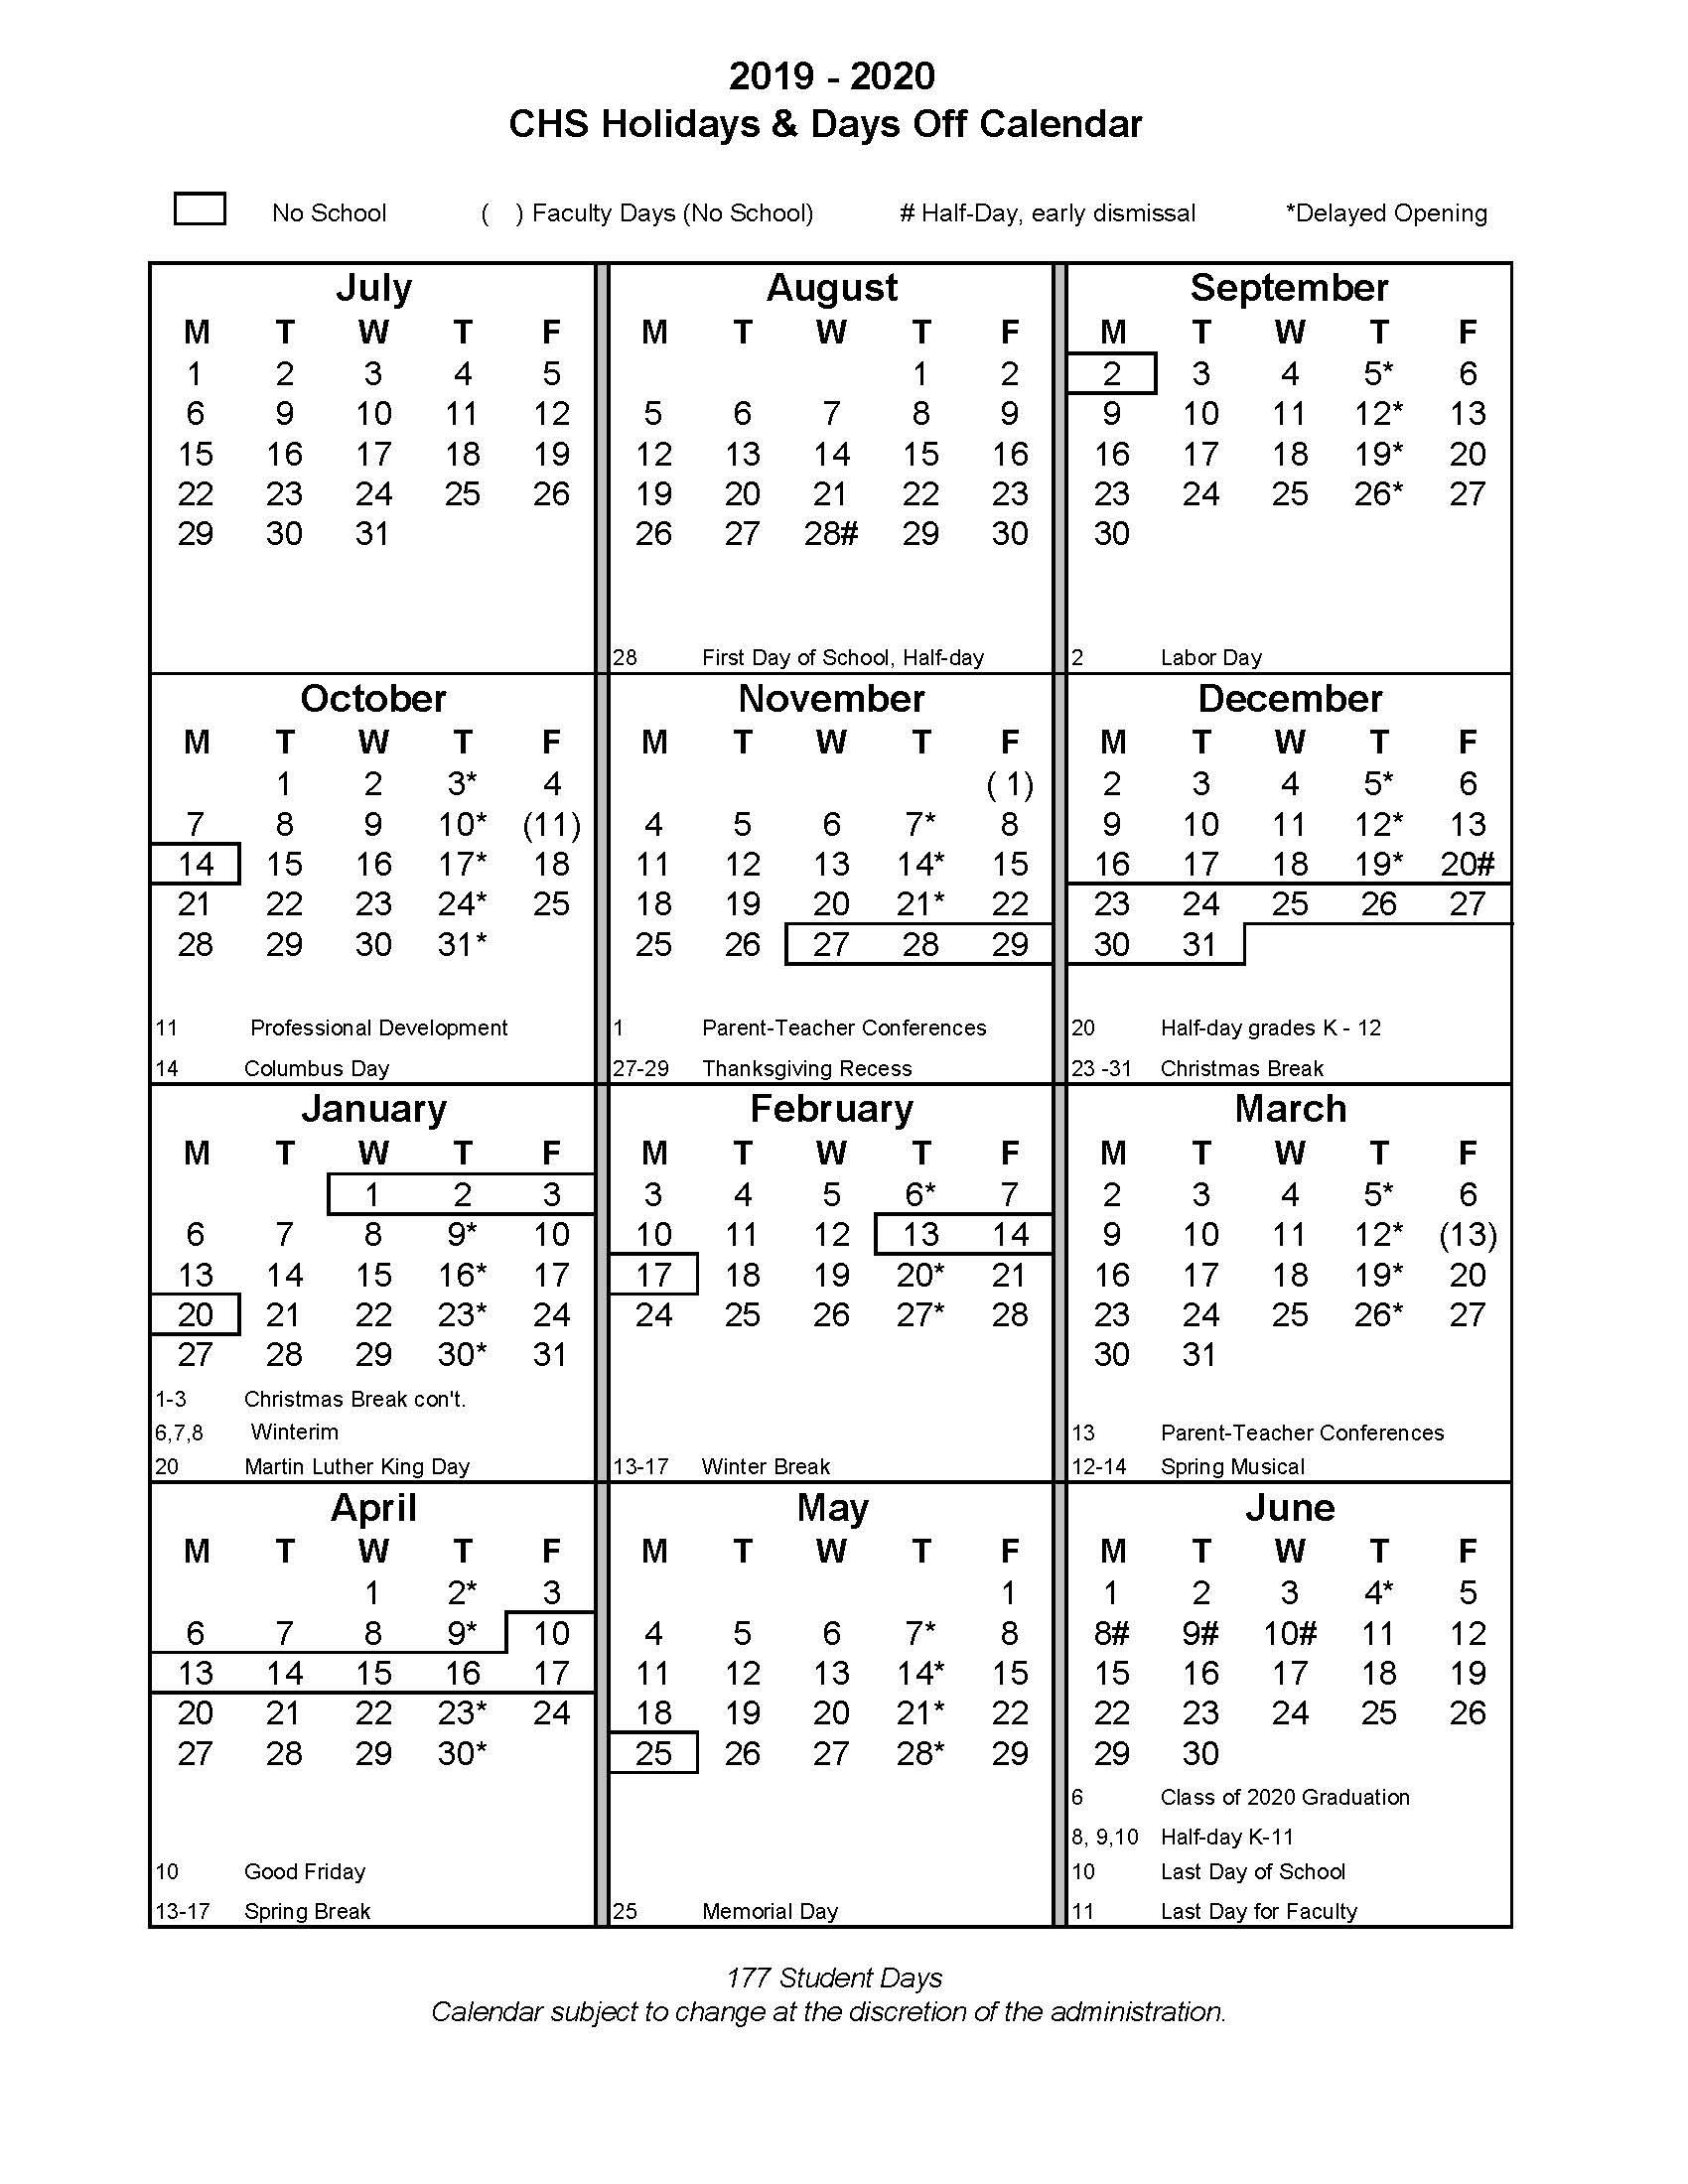 2019/20 School Year - Christian Heritage School_School Calendar Trumbull Ct